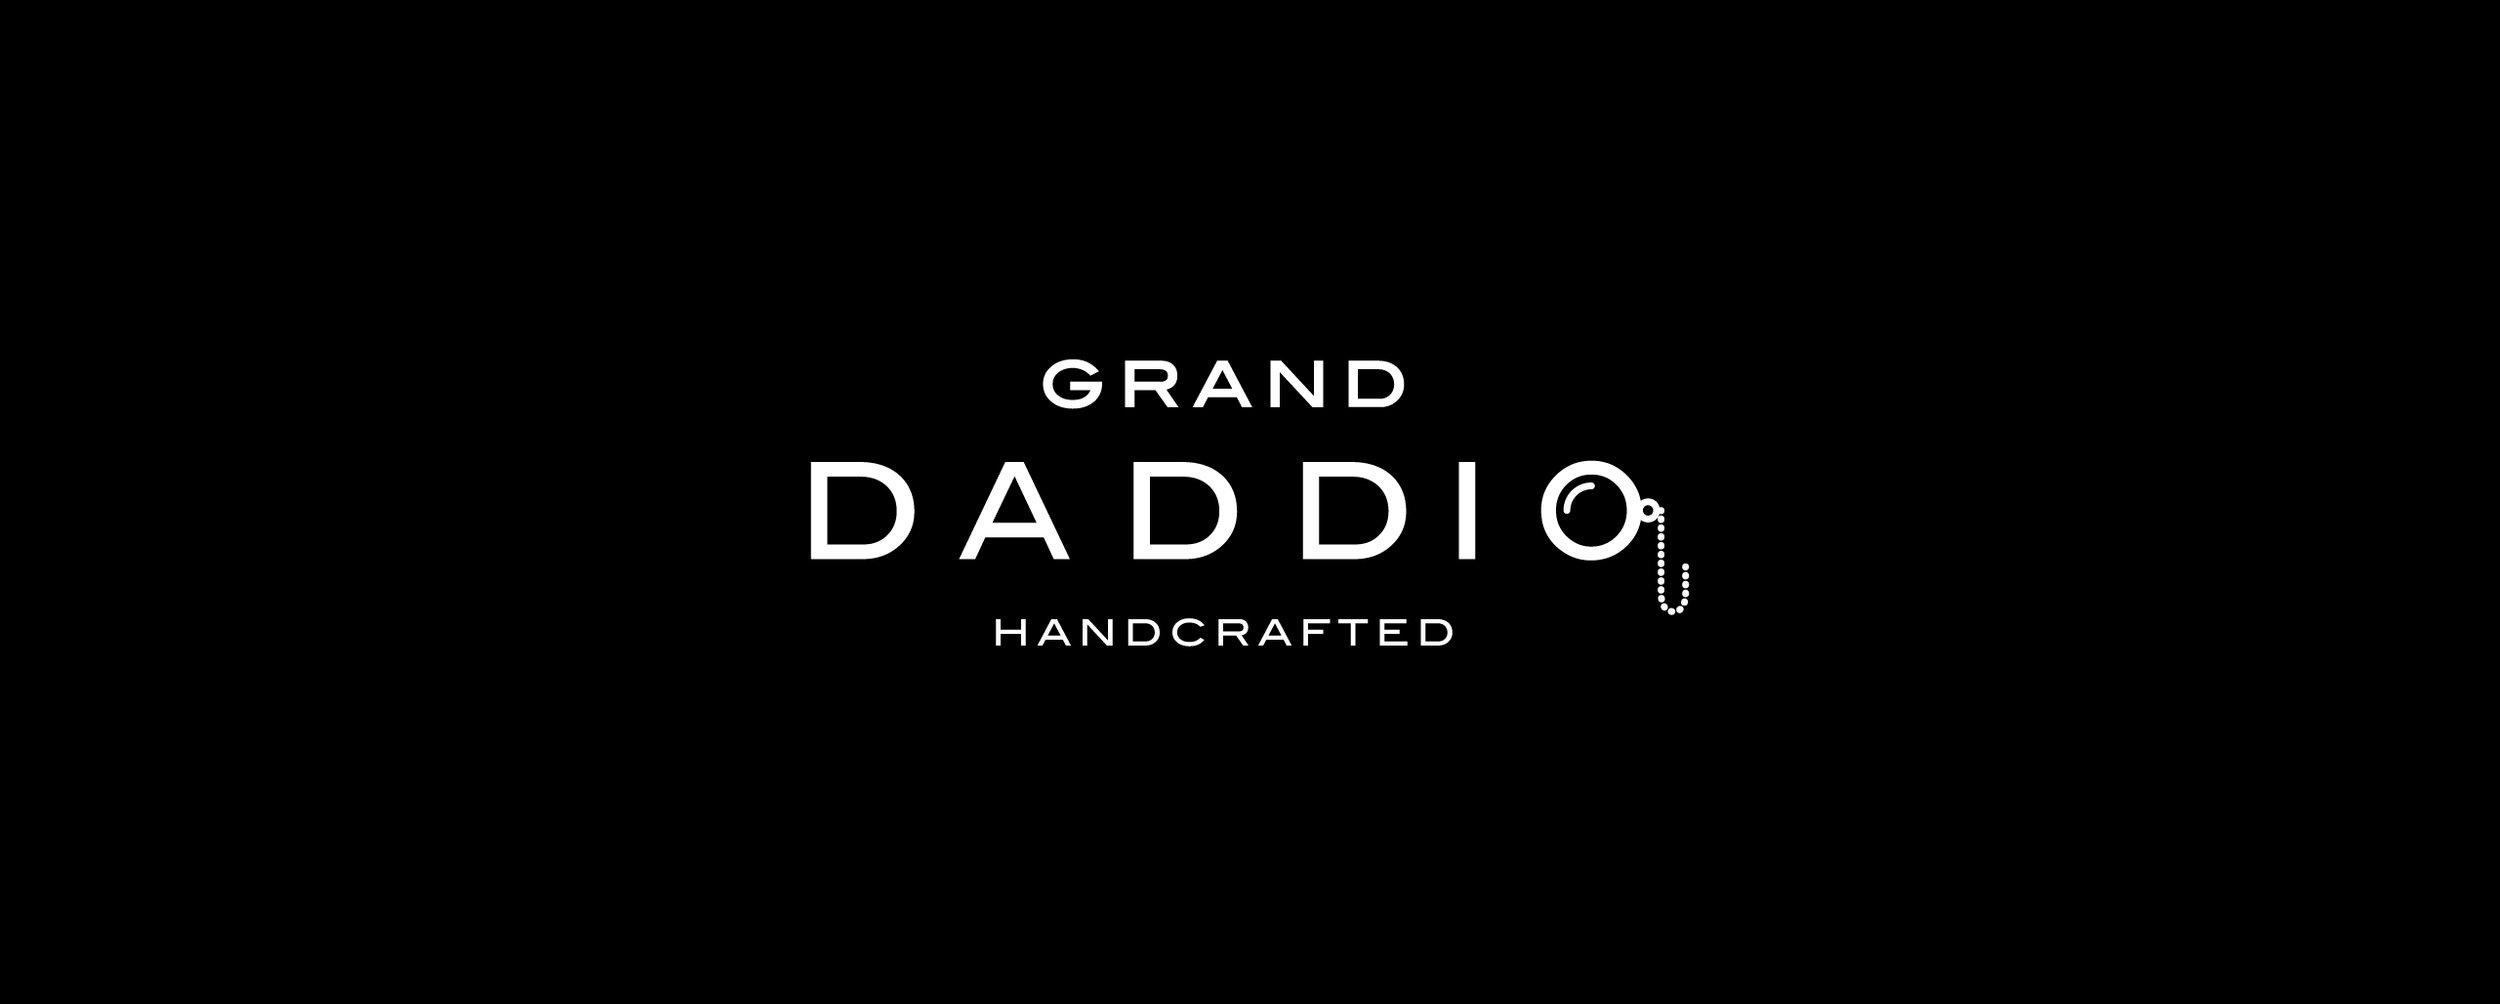 grand-daddio-blackbg.jpg